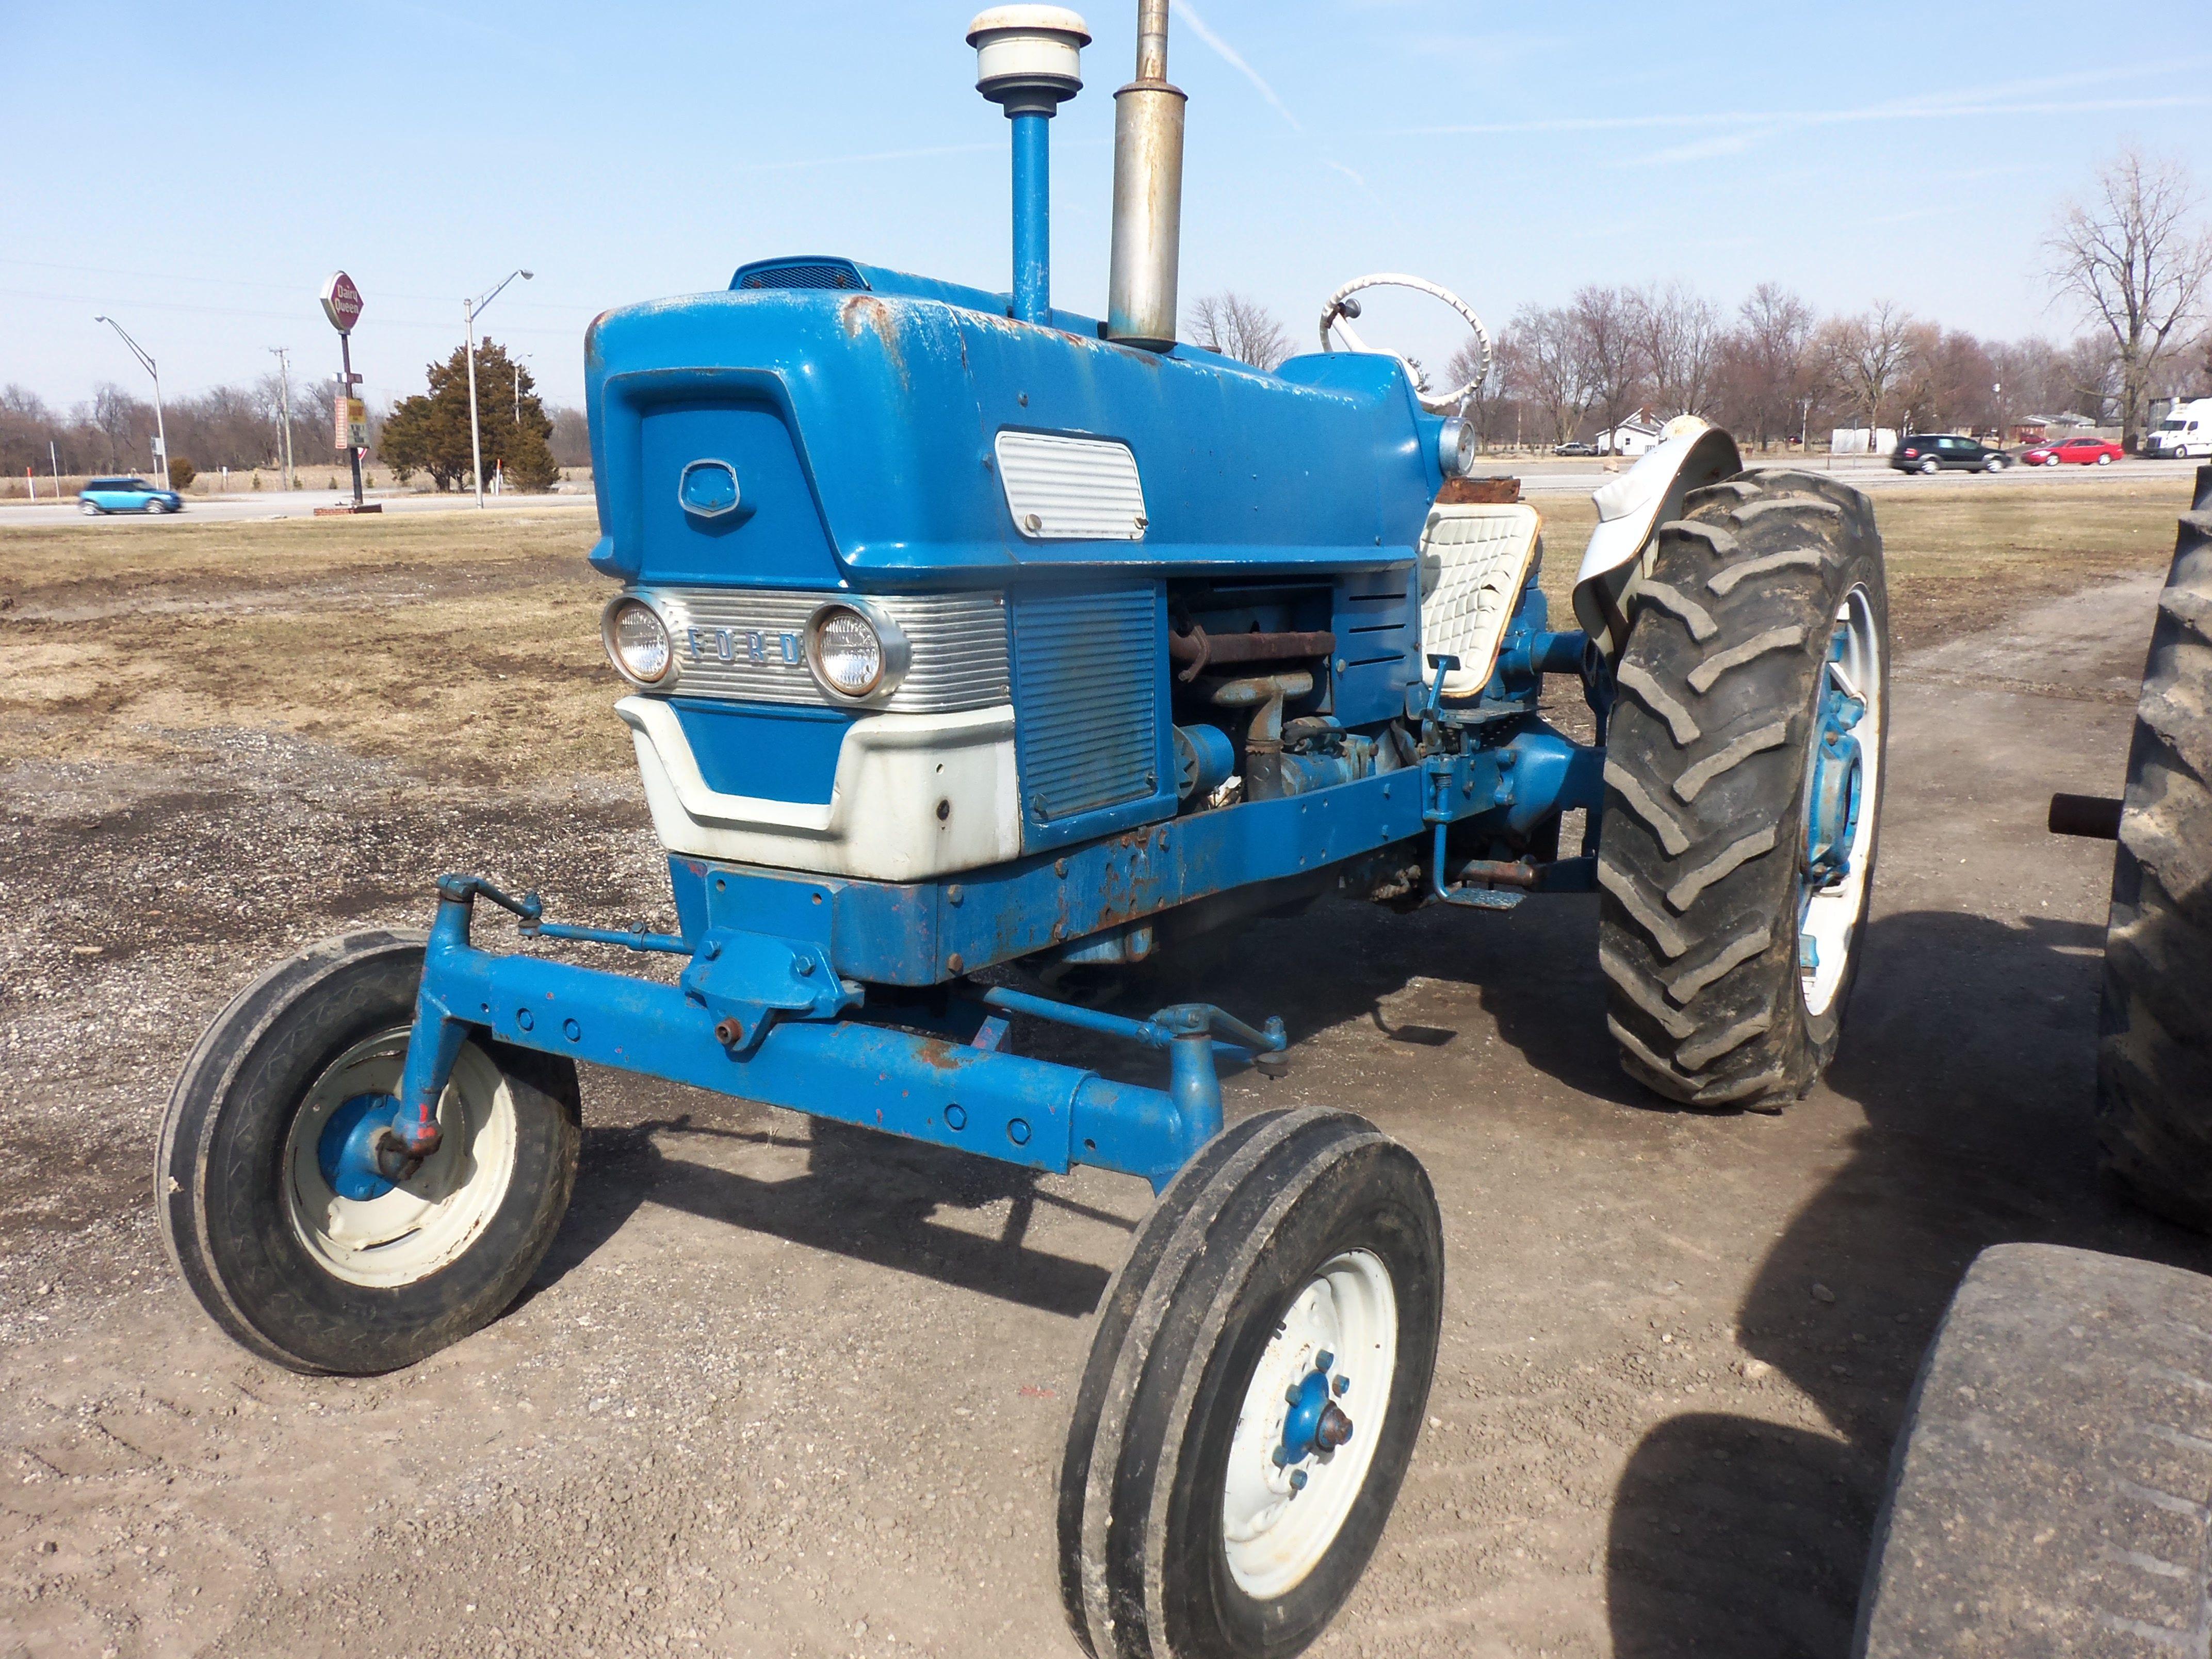 Ford 6000 Tractor Tractors Ford Tractors Vintage Tractors